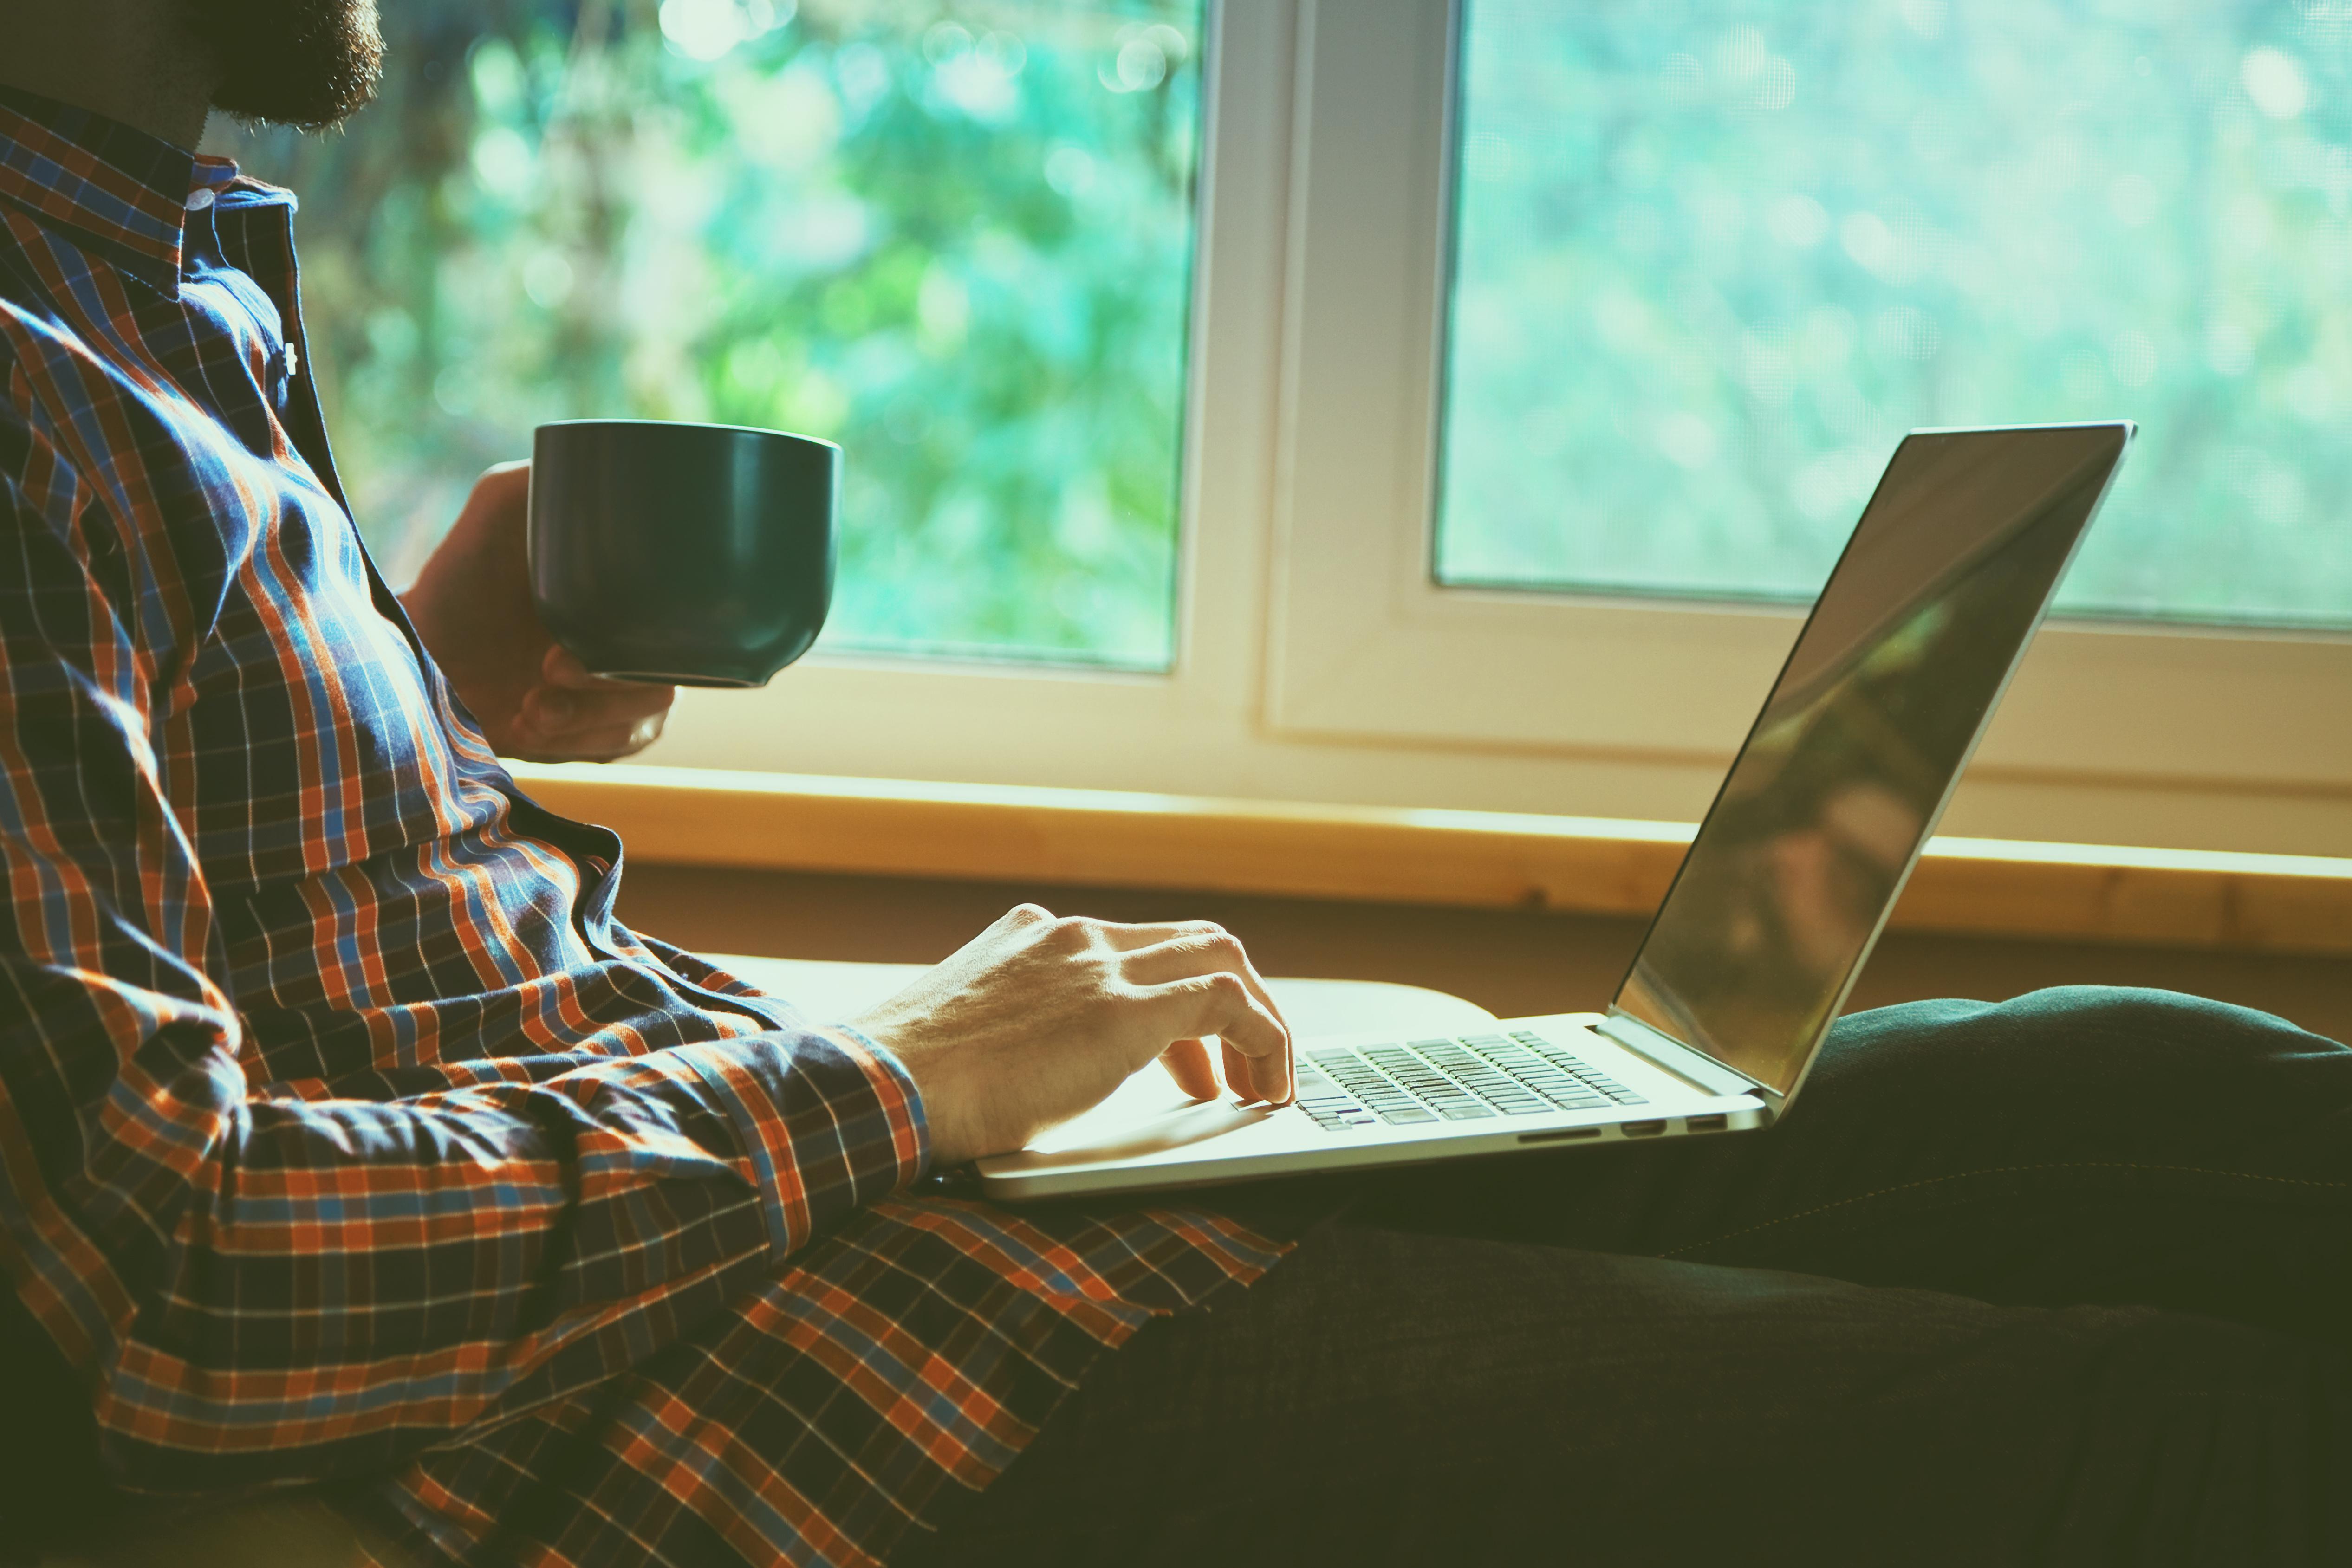 Kreator listu motywacyjnego online